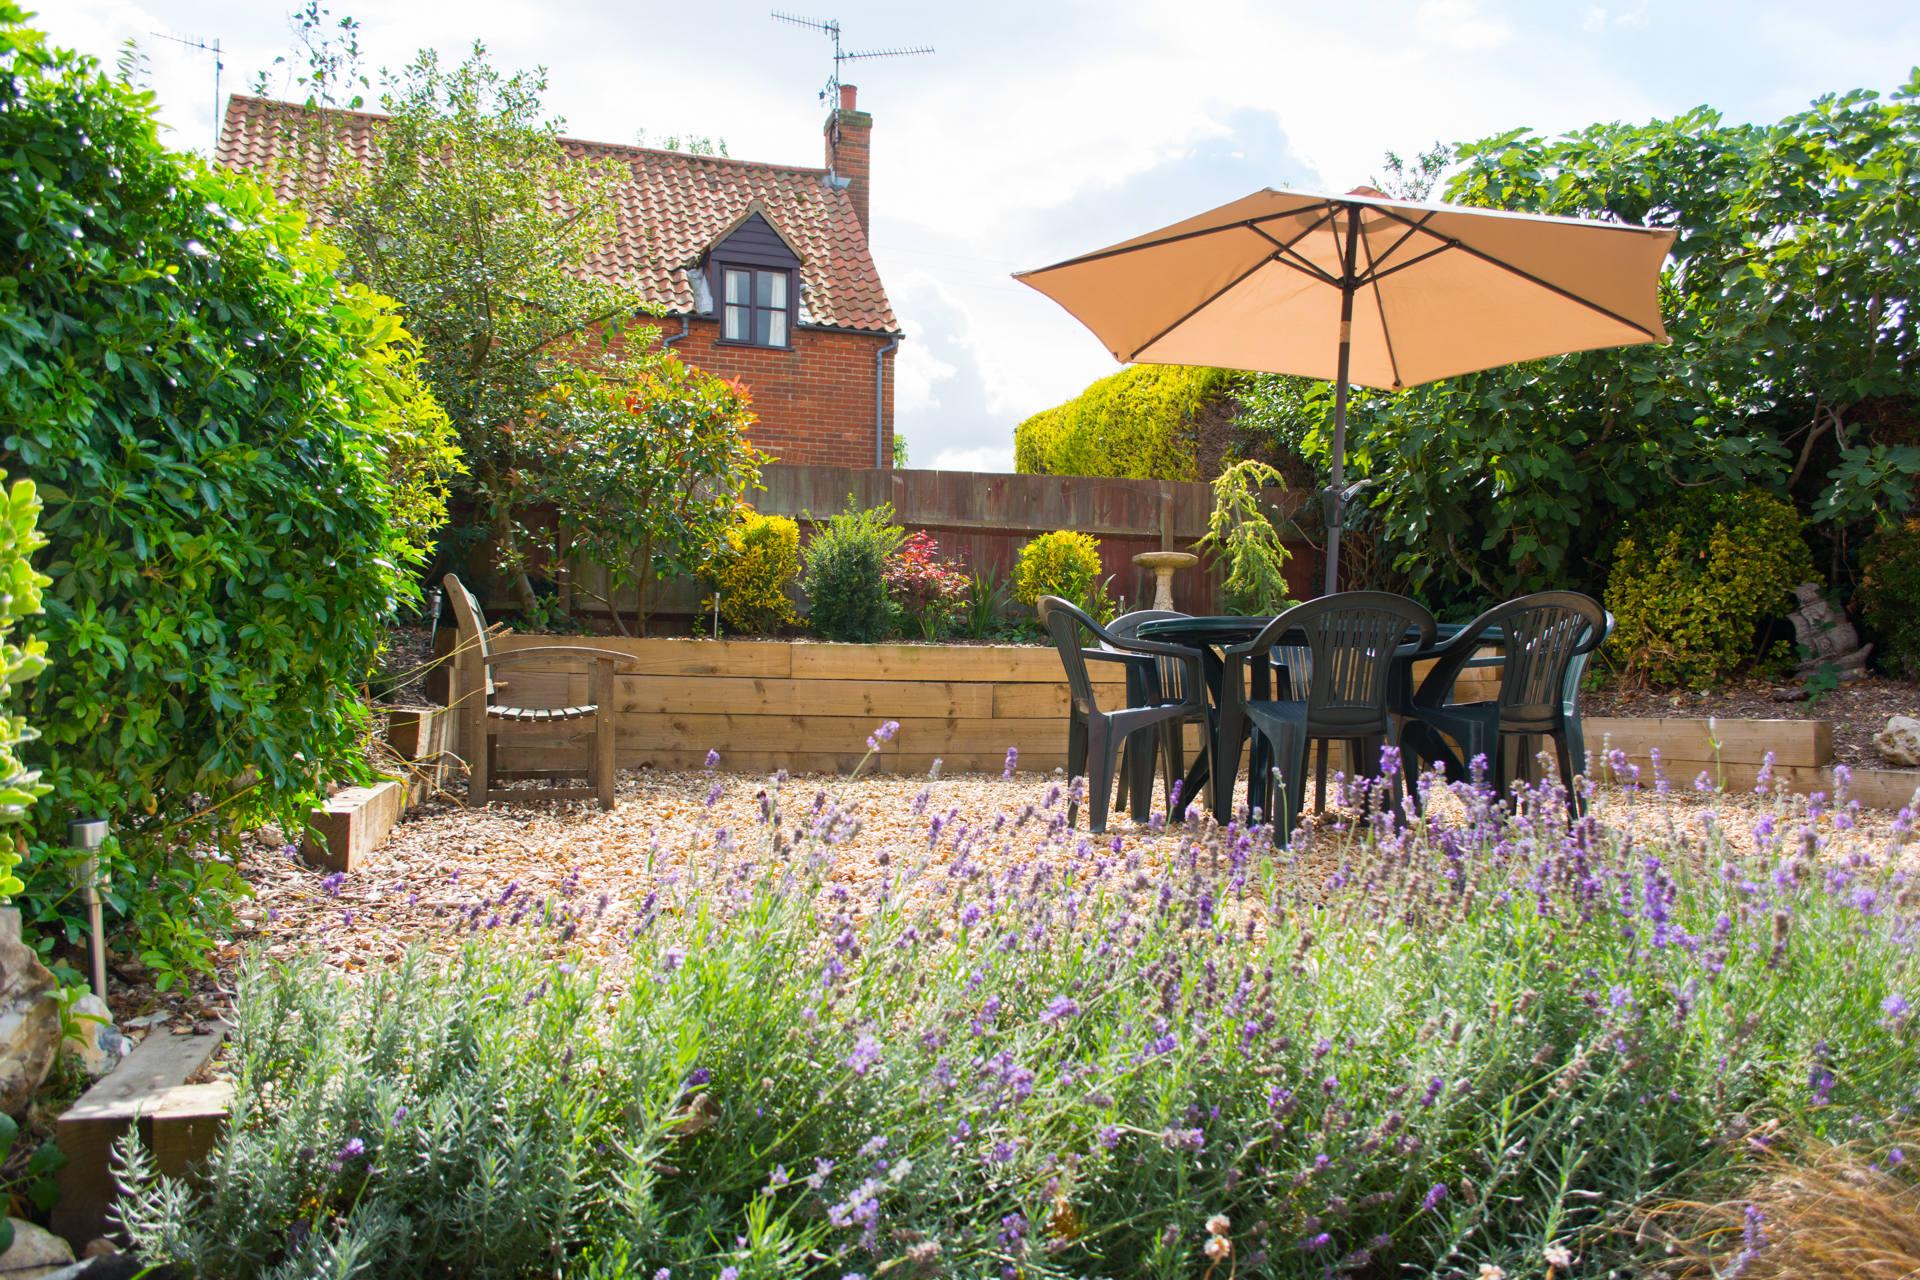 Shingled garden and raised dining area.